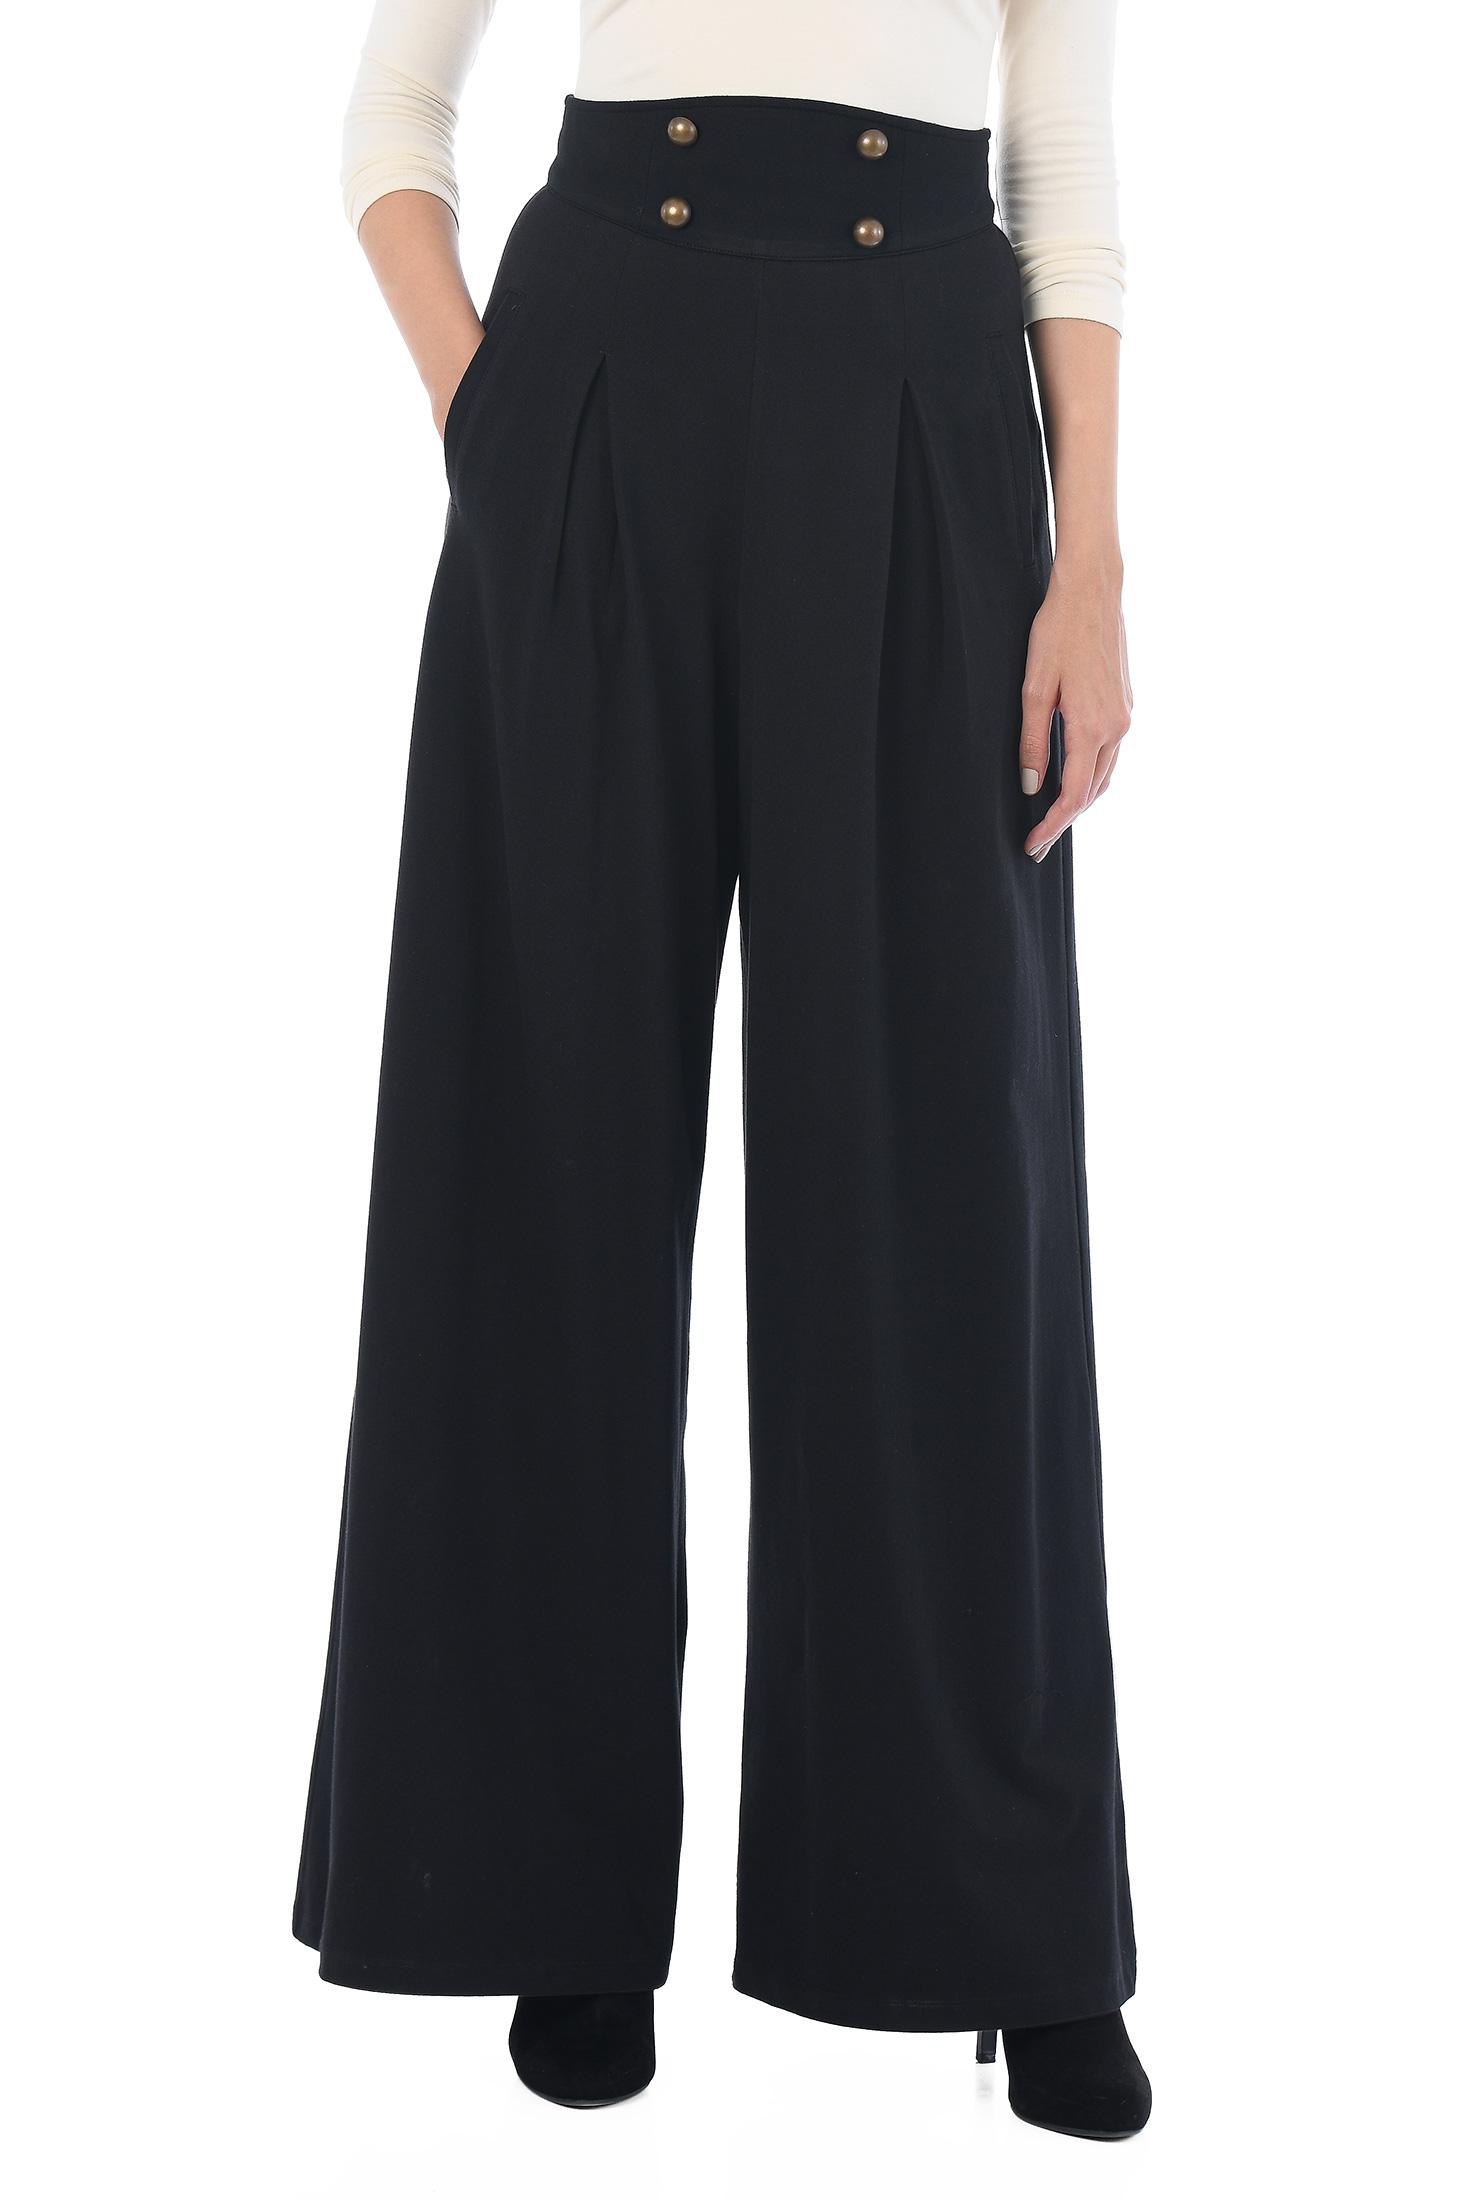 Eshakti Womens Button Waistband Cotton Knit Pants